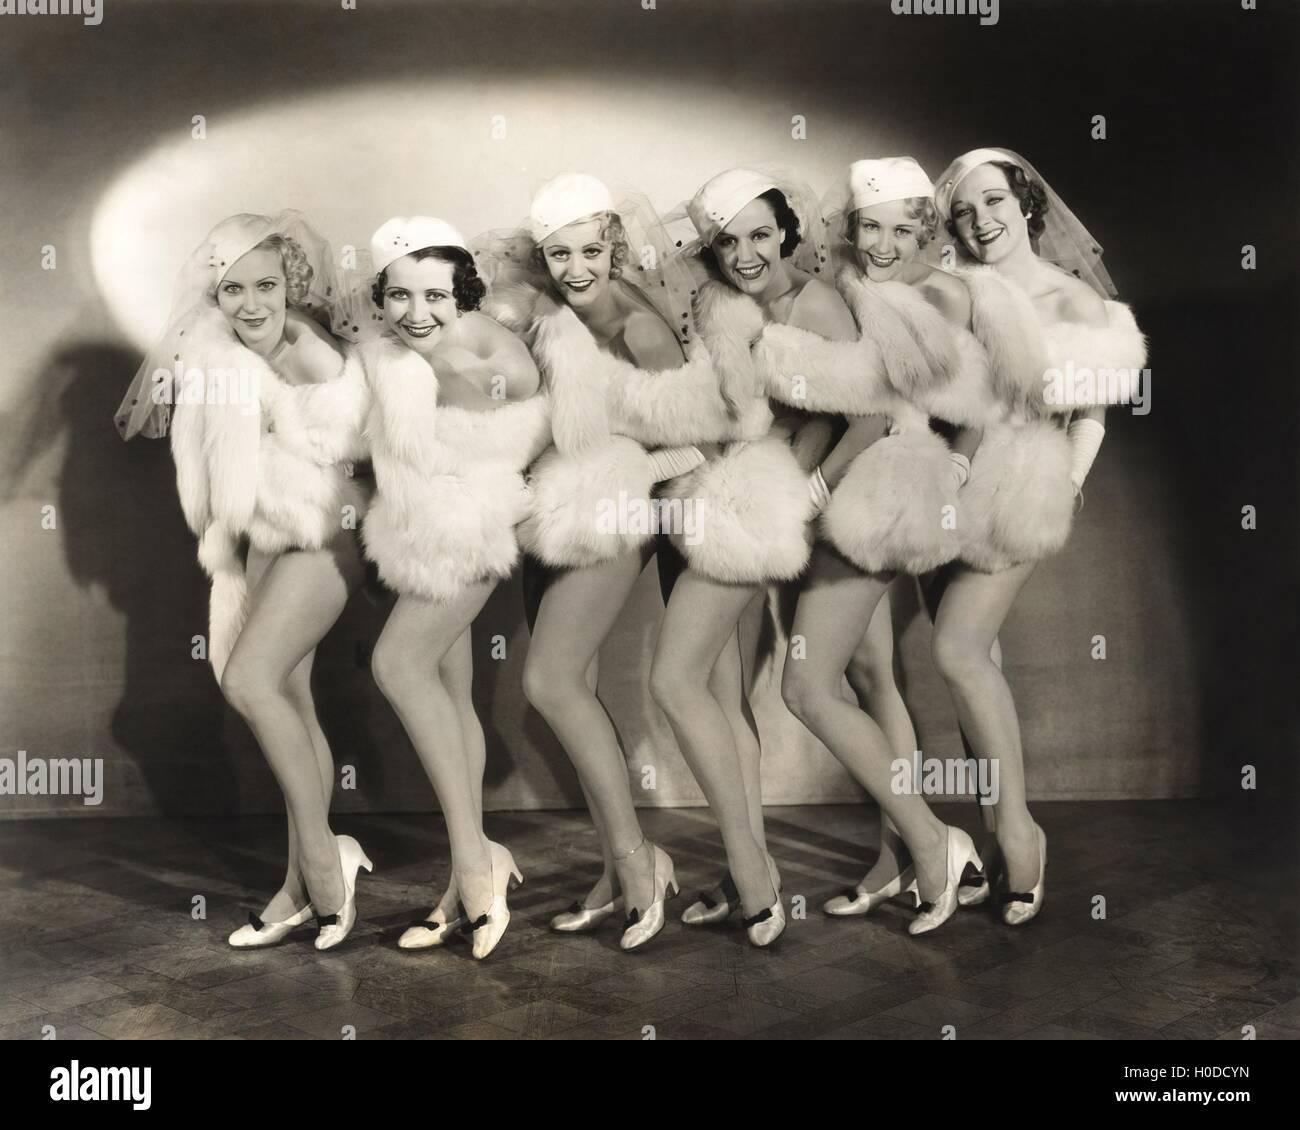 Line of chorus girls in white fur - Stock Image